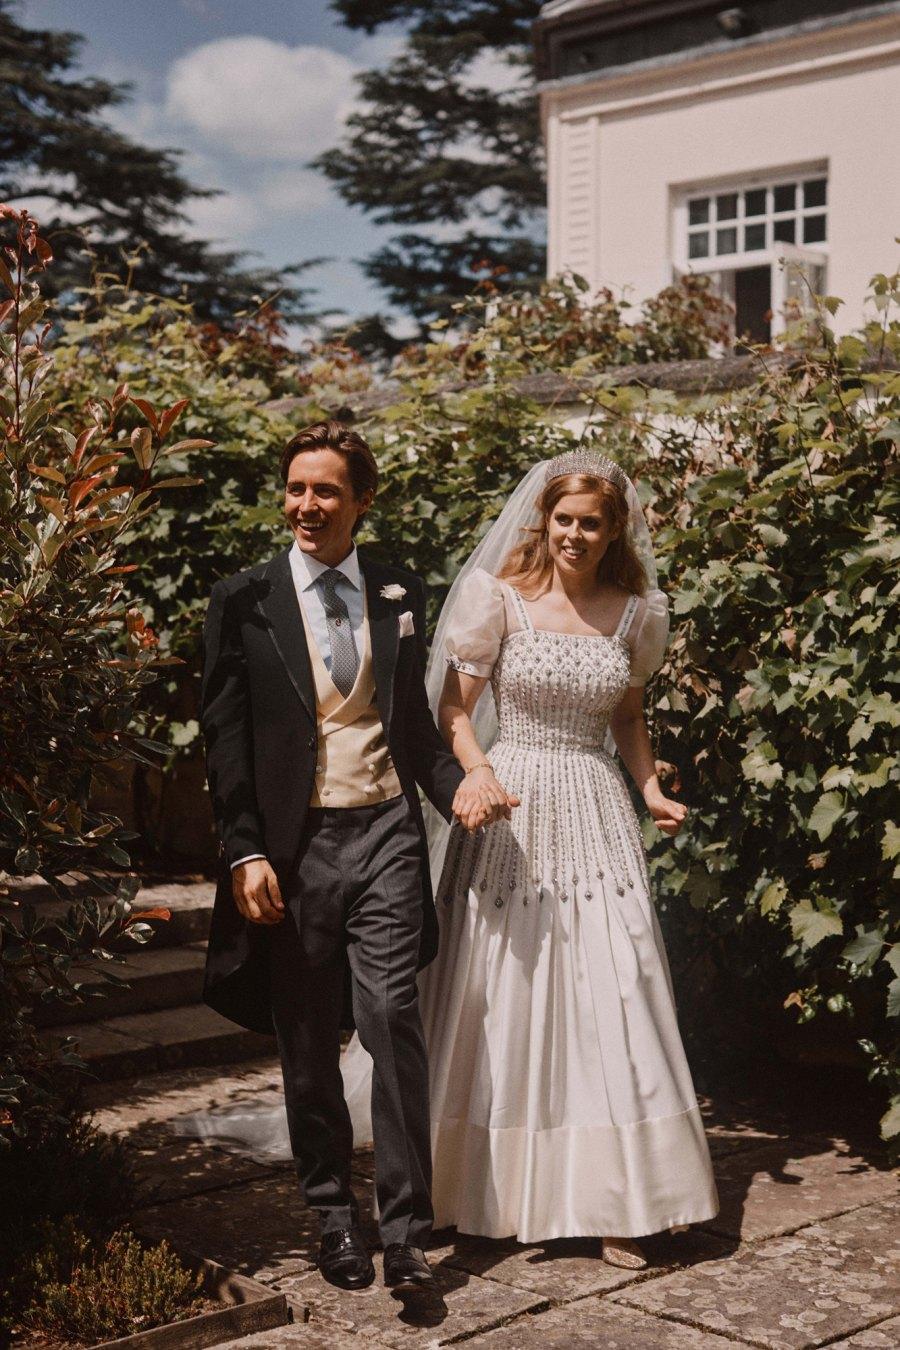 Princess Beatrice and Edoardo Mapelli Mozzi Wedding